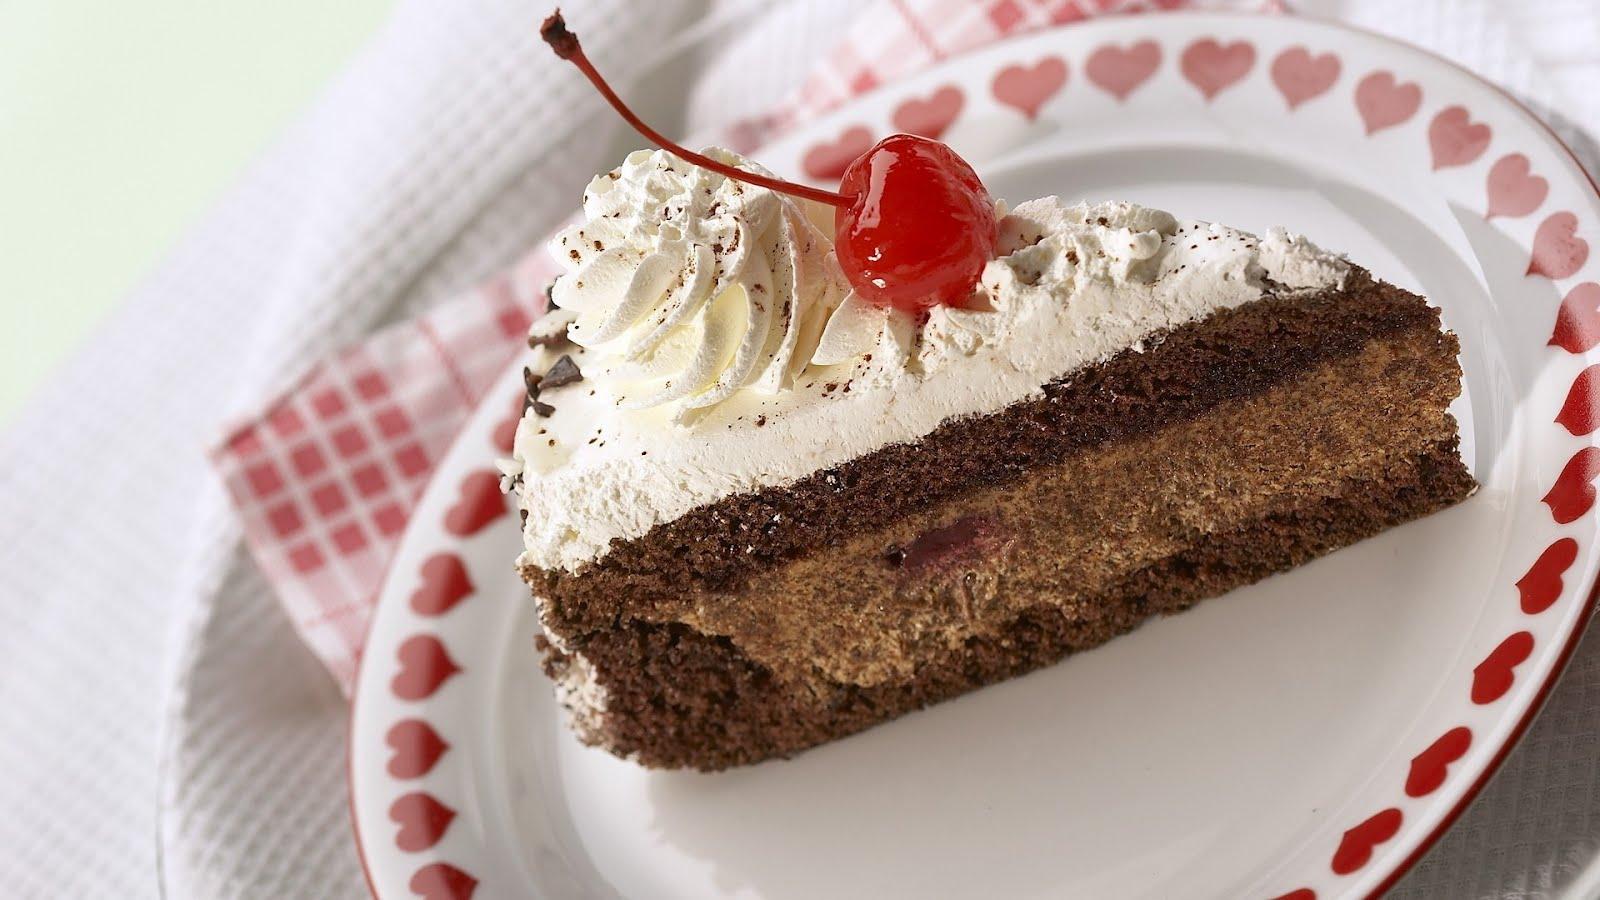 http://1.bp.blogspot.com/-qcFr-KA8Zx0/T6TqWnlM7rI/AAAAAAAAAWc/bMA0mfJsAeo/s1600/cake-wallpaper-1080p.jpg